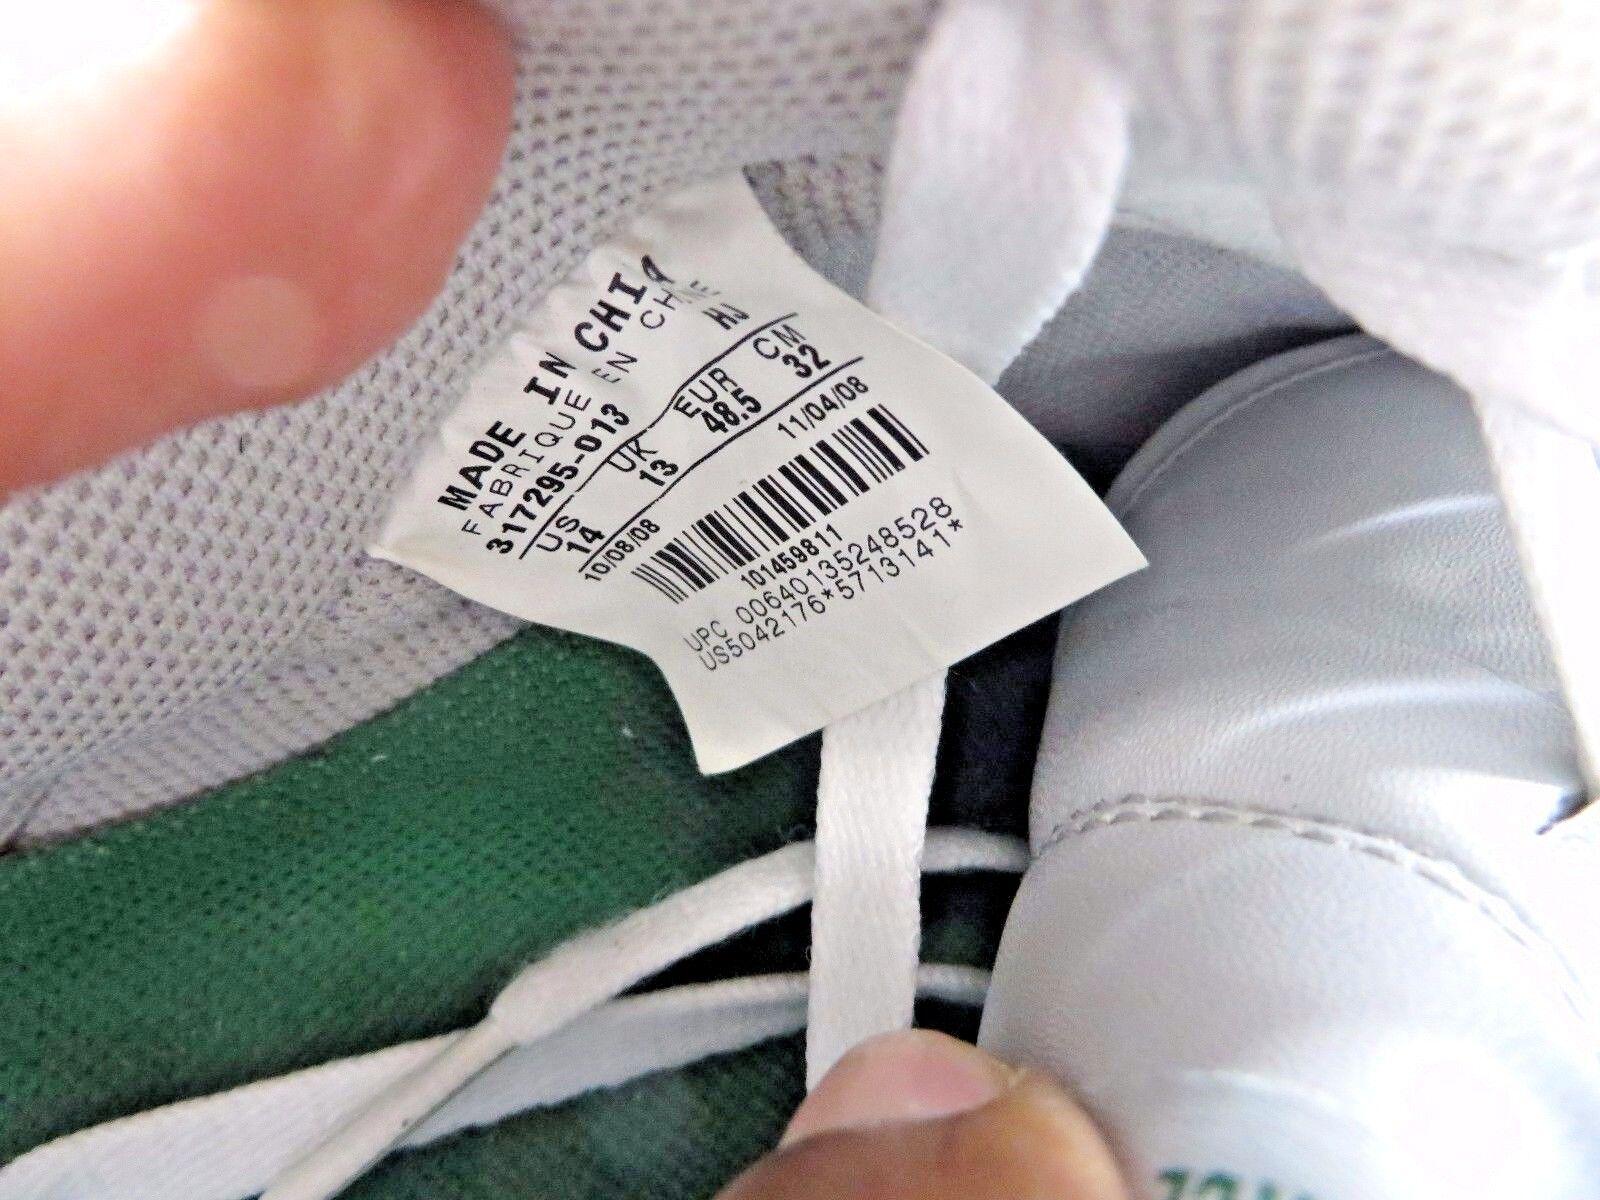 4937eac0017 Nike Nike Nike Air Force 1 Low '07 Neutral Grey Pine Green White ...